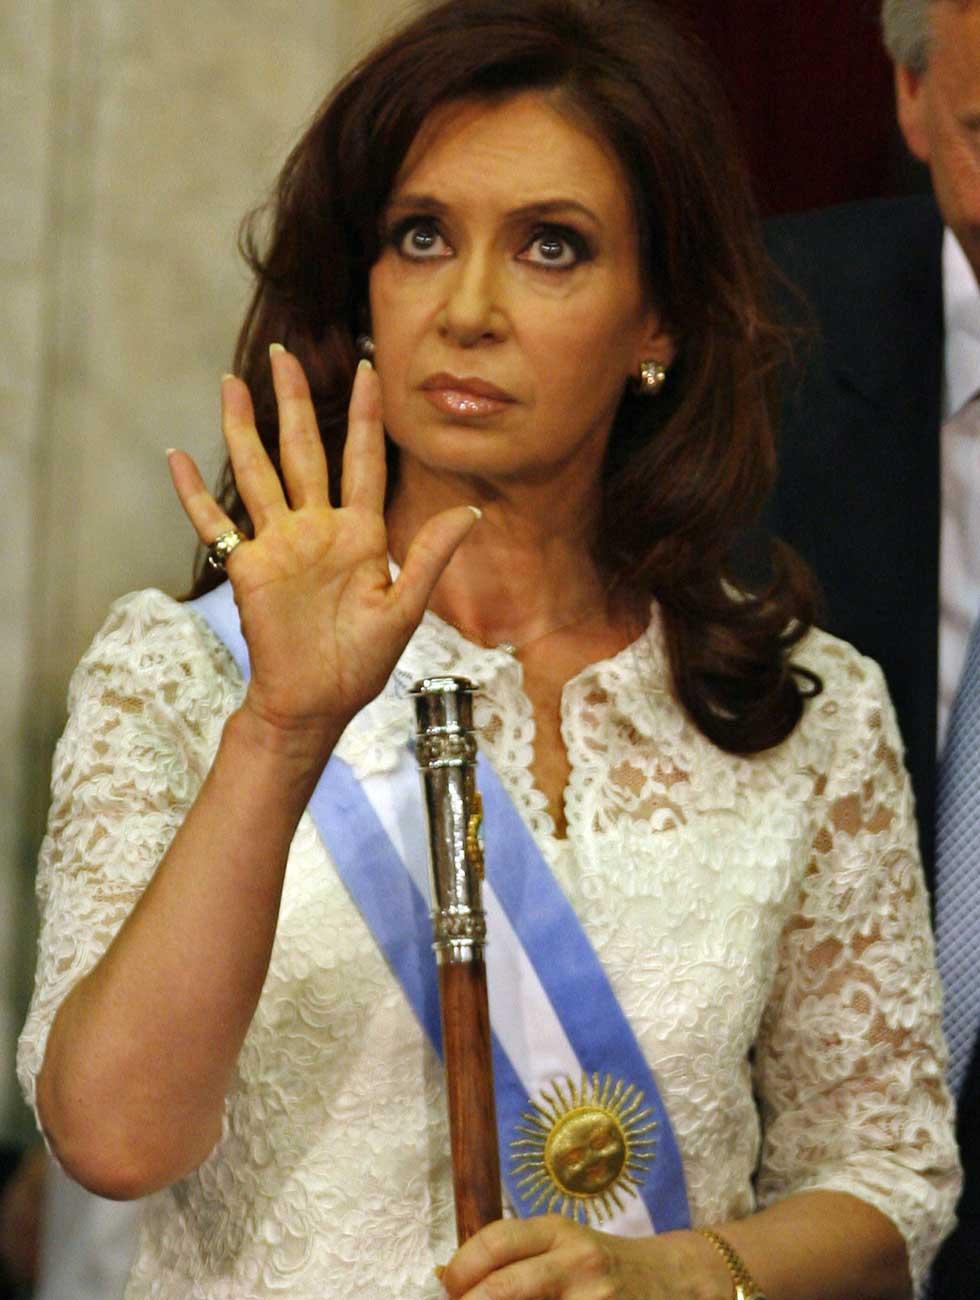 http://2.bp.blogspot.com/-KUGmiWYRNvg/UAJkvygxmGI/AAAAAAAAE8Q/sowAlAMHQVs/s1600/Cristina_Fernandez.jpg